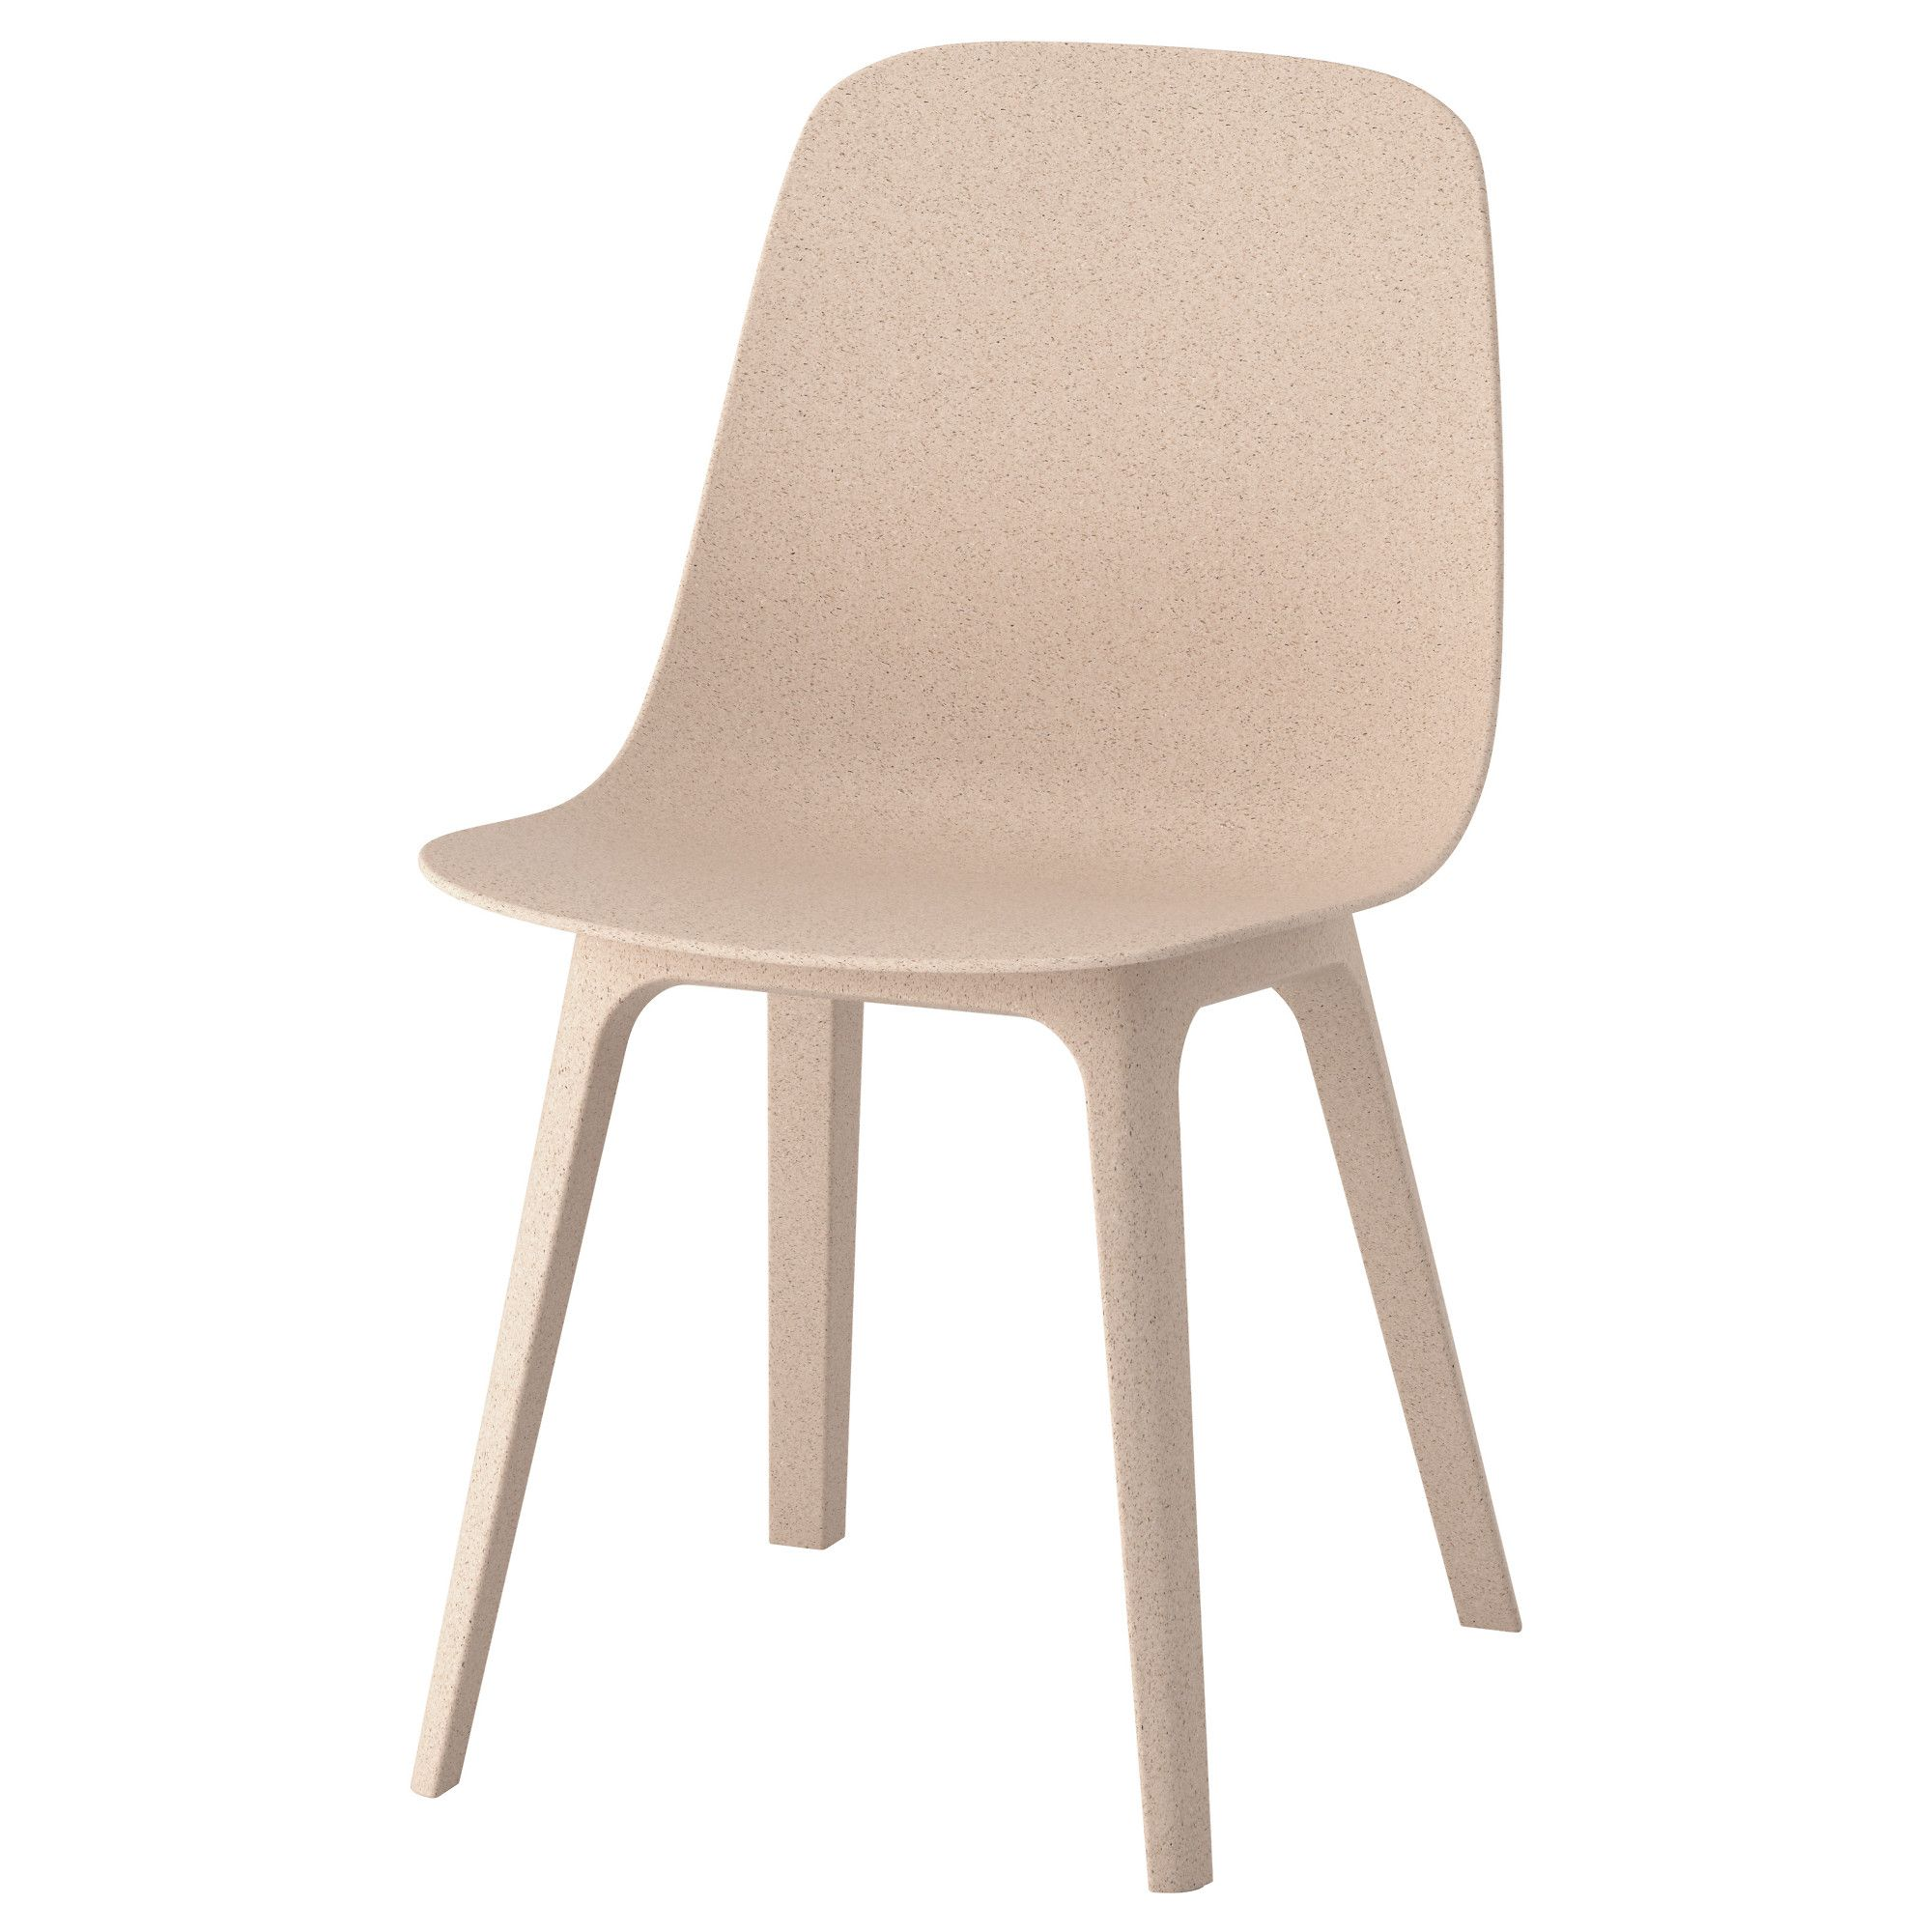 IKEA ODGER Chair white, beige Ikea dining chair, Ikea